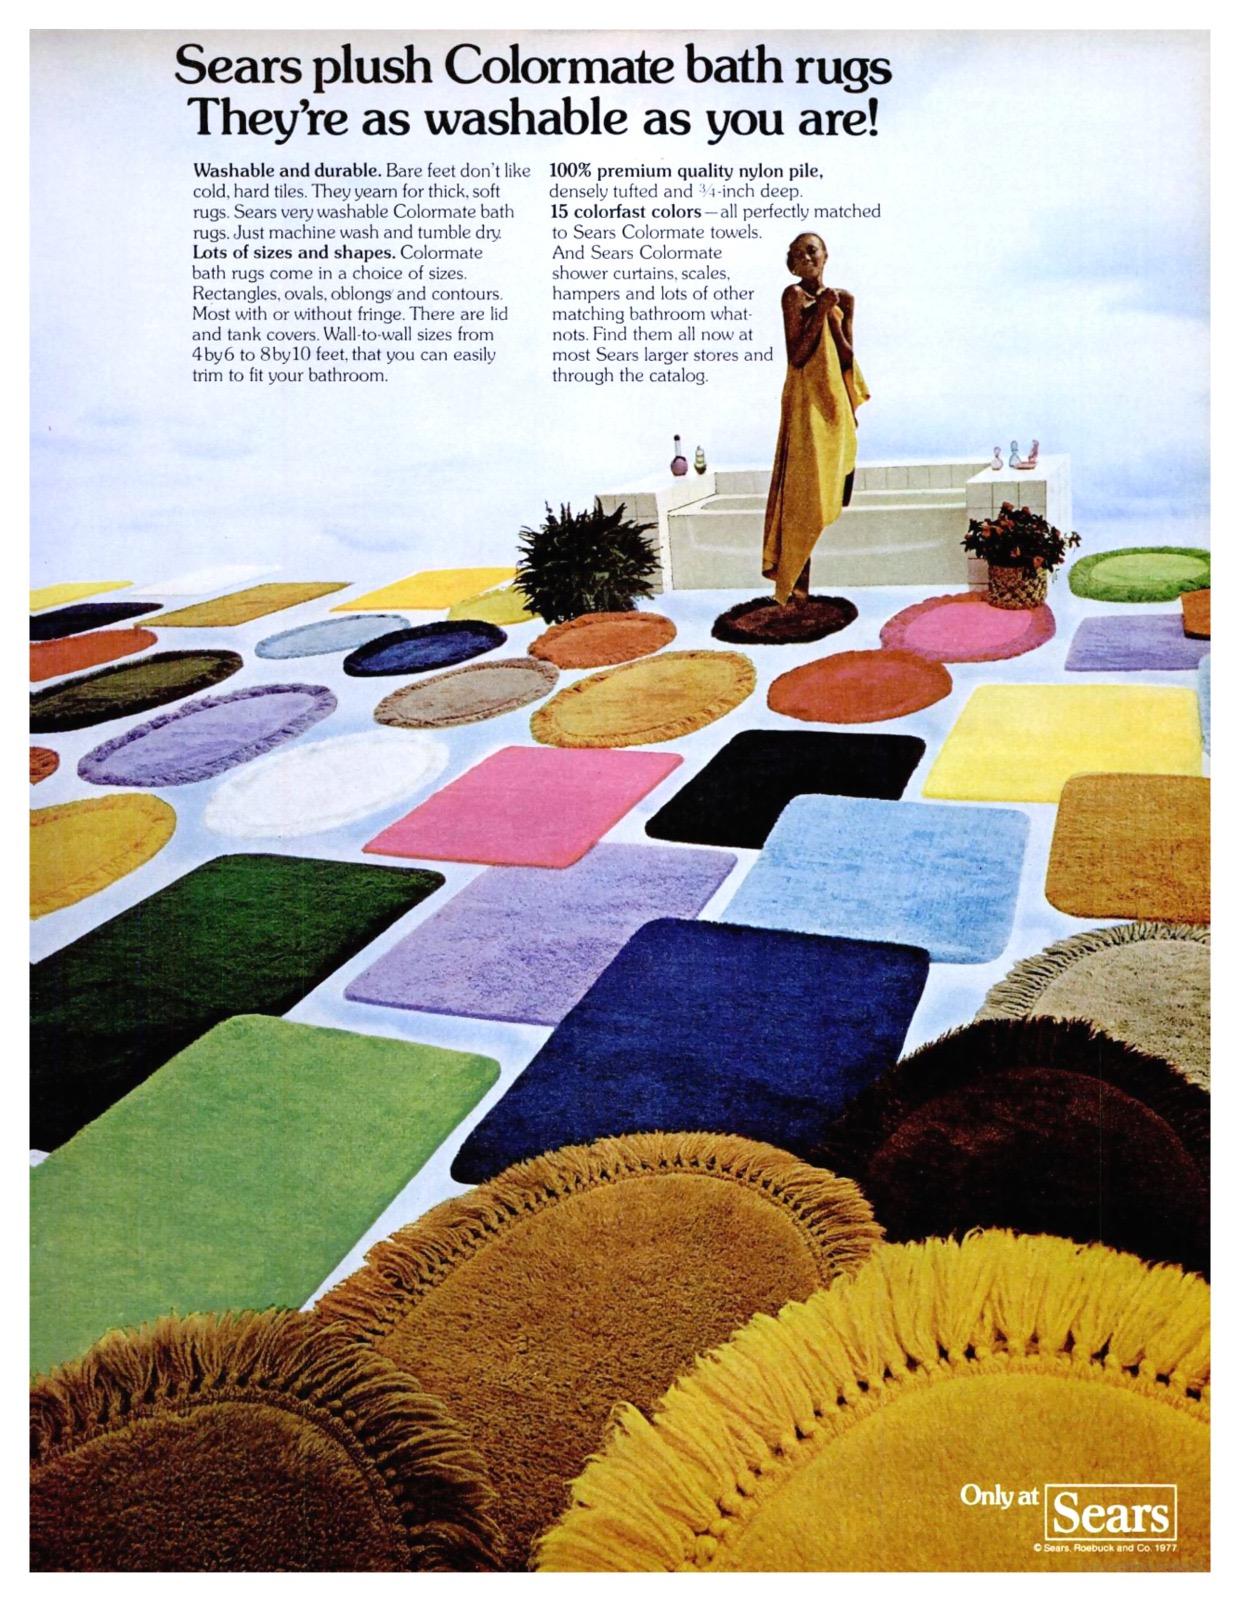 Sears Colormate Bath Rugs 1977